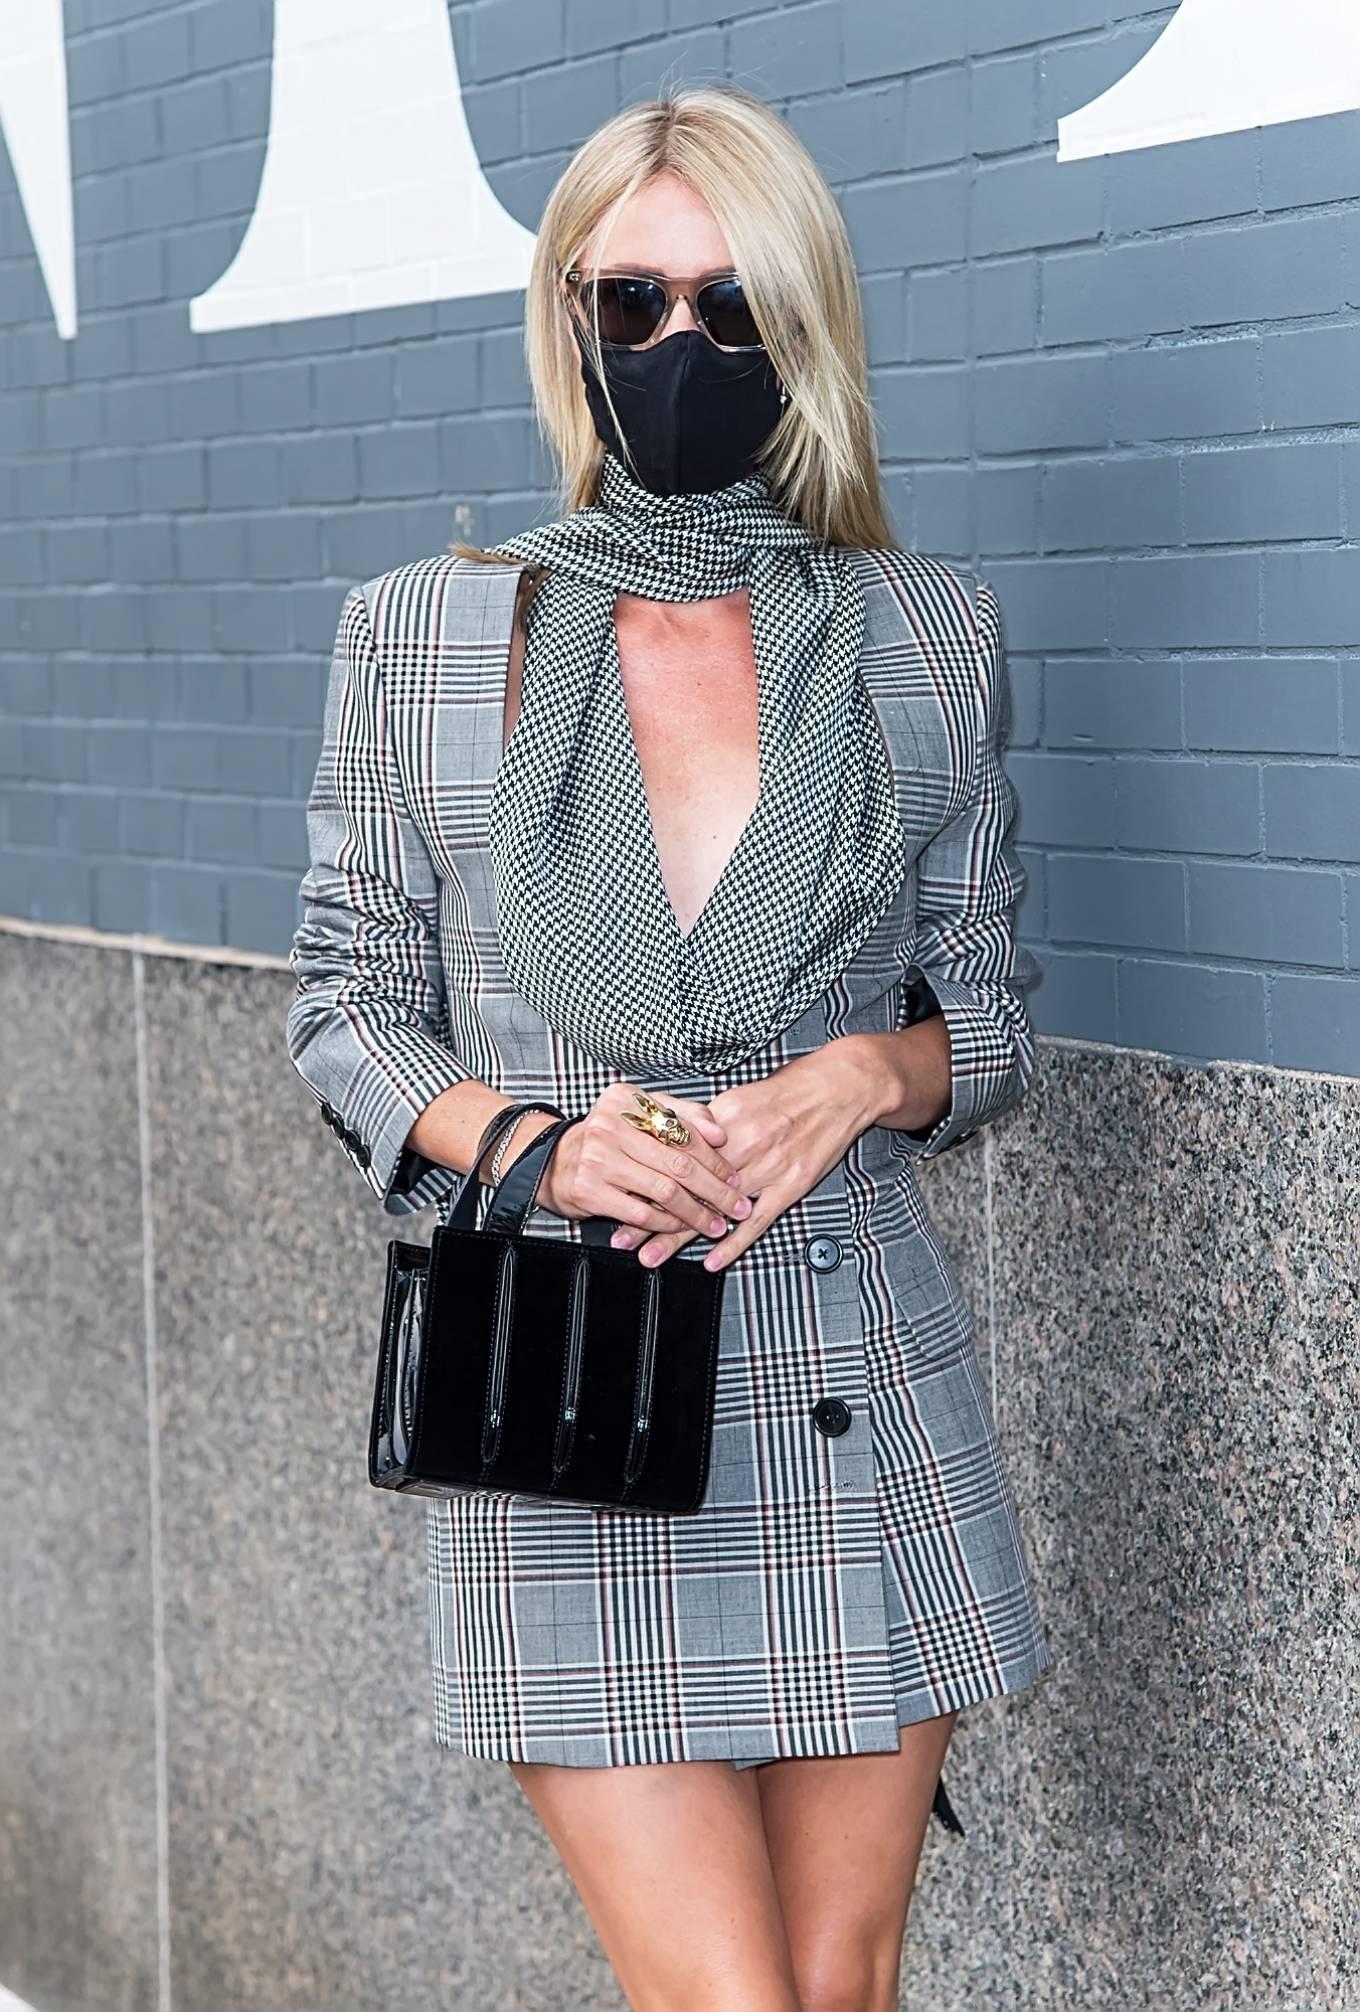 Nicky Hilton 2020 : Nicky Hilton – New York Fashion Week – Monse Fall-Winter 2020 Presentation-28